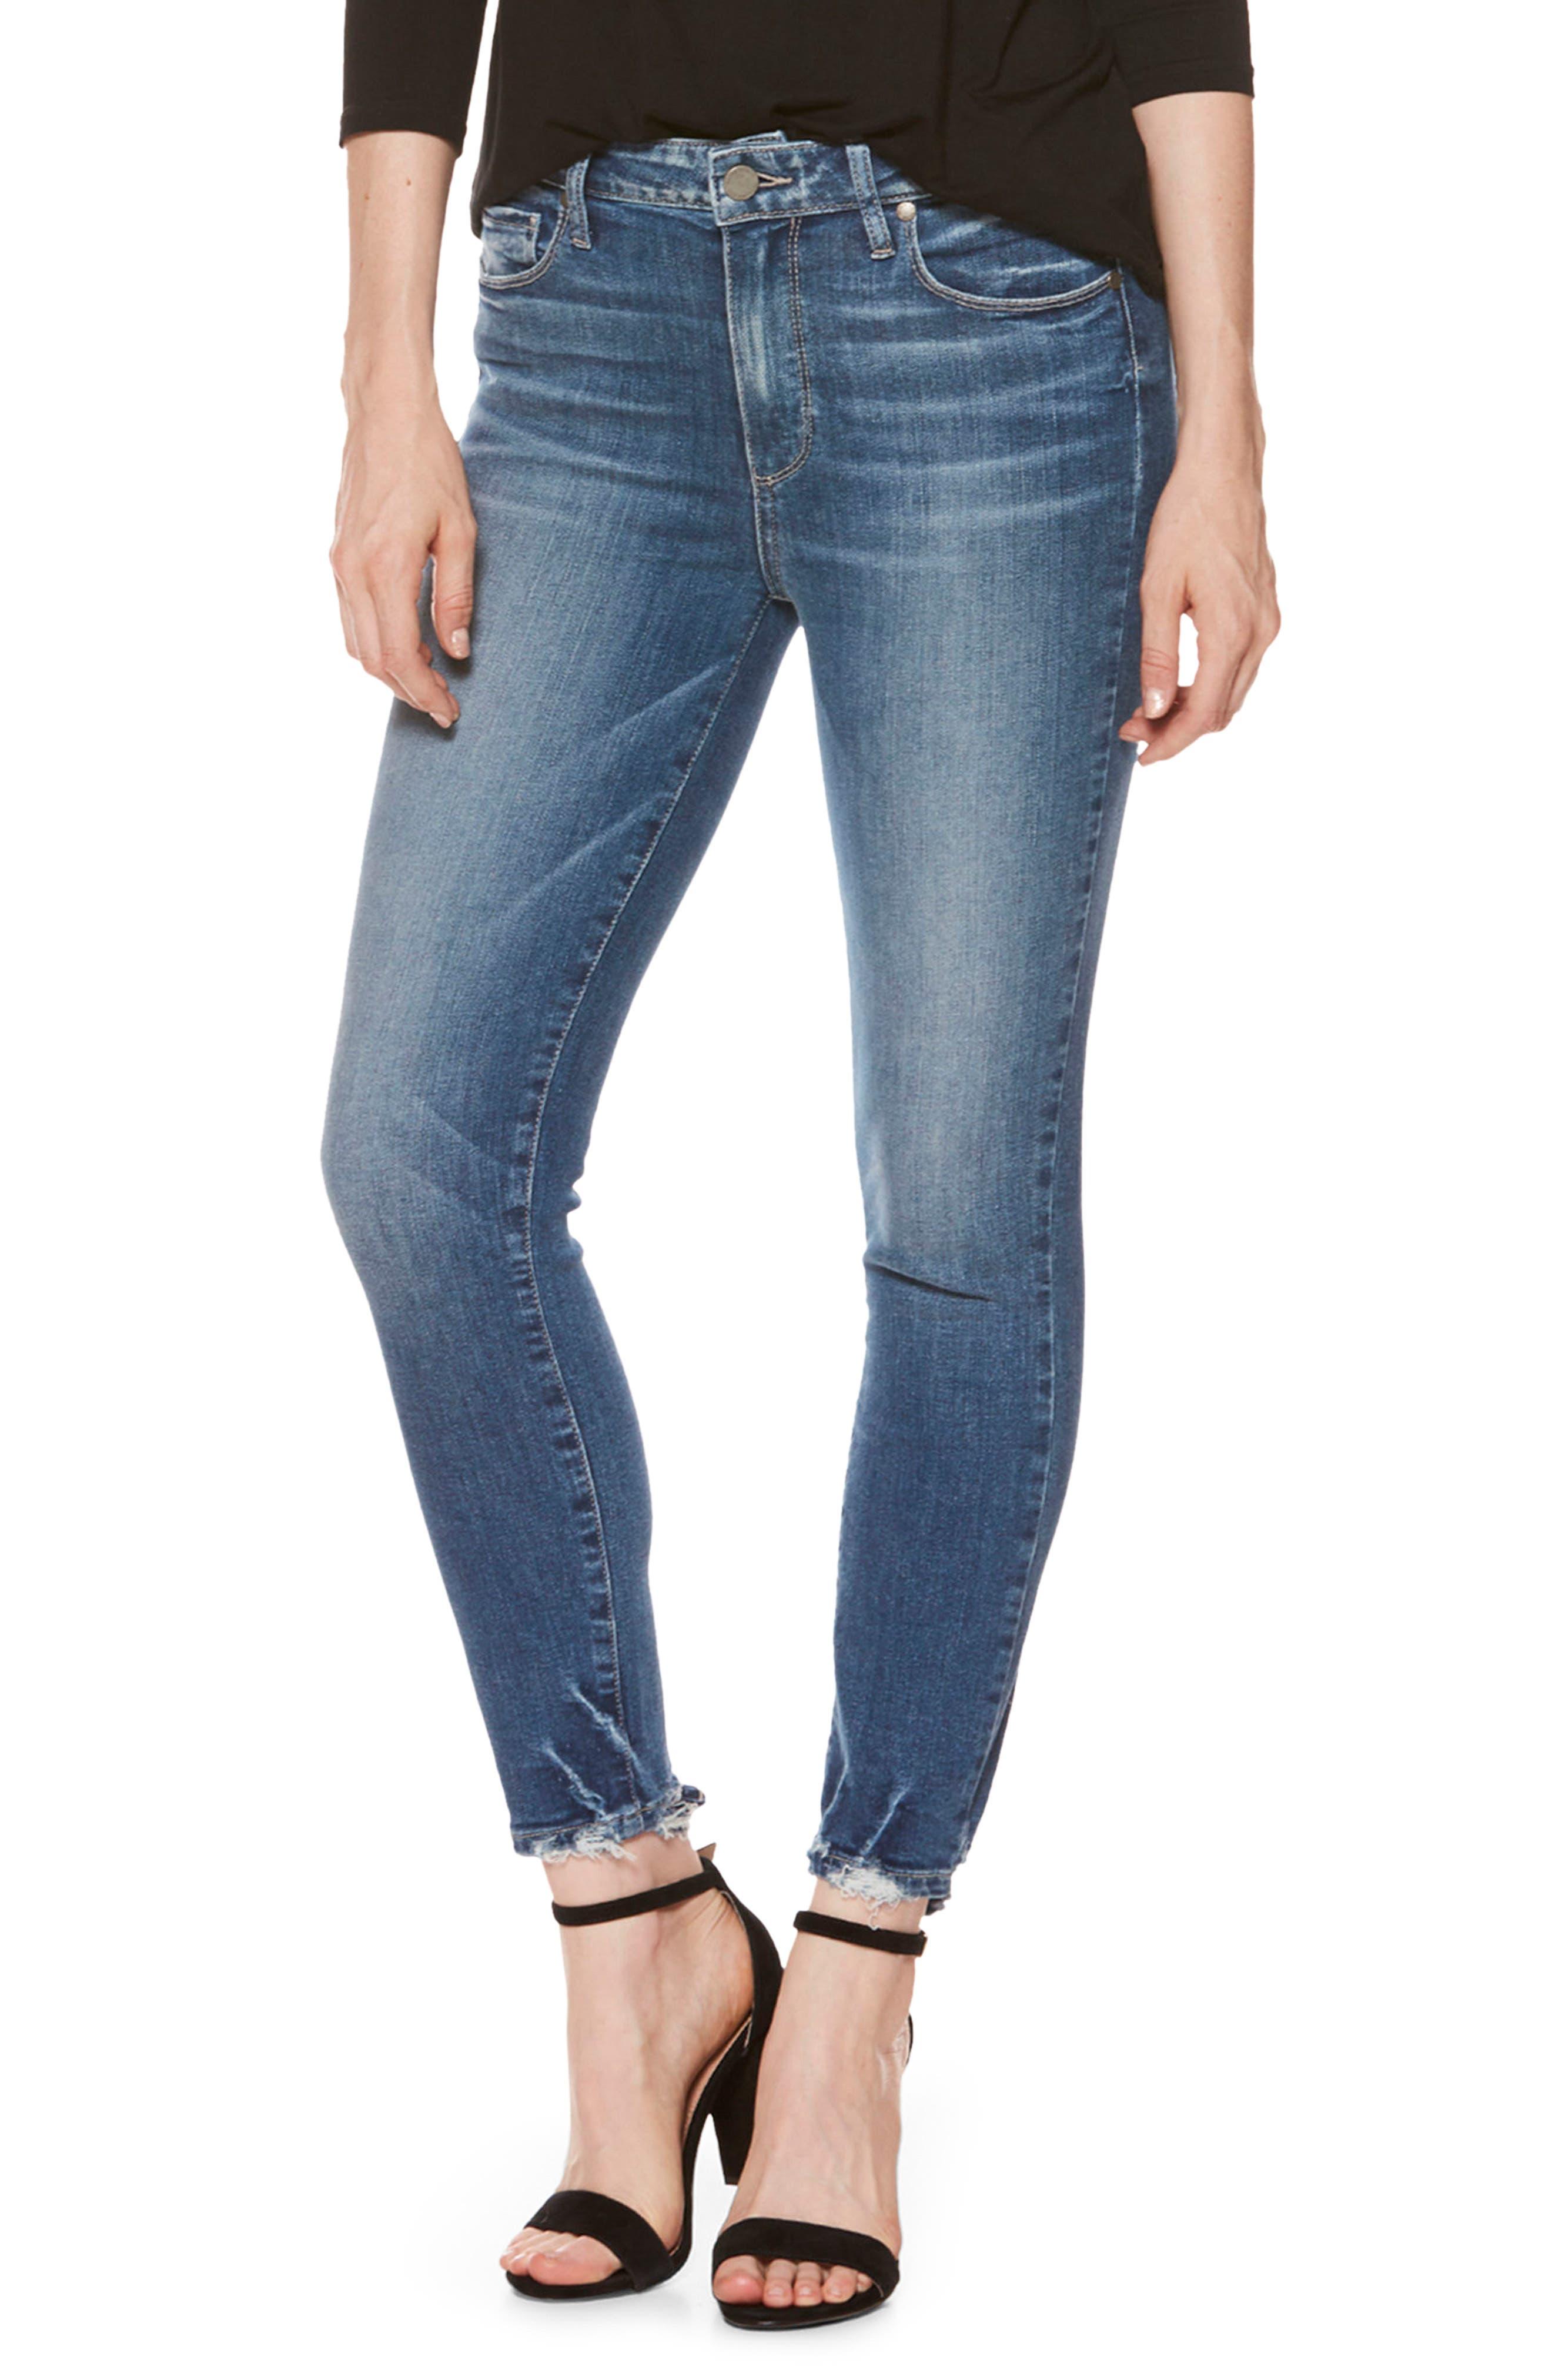 Alternate Image 1 Selected - PAIGE Hoxton High Waist Crop Skinny Jeans (Addler Blue)